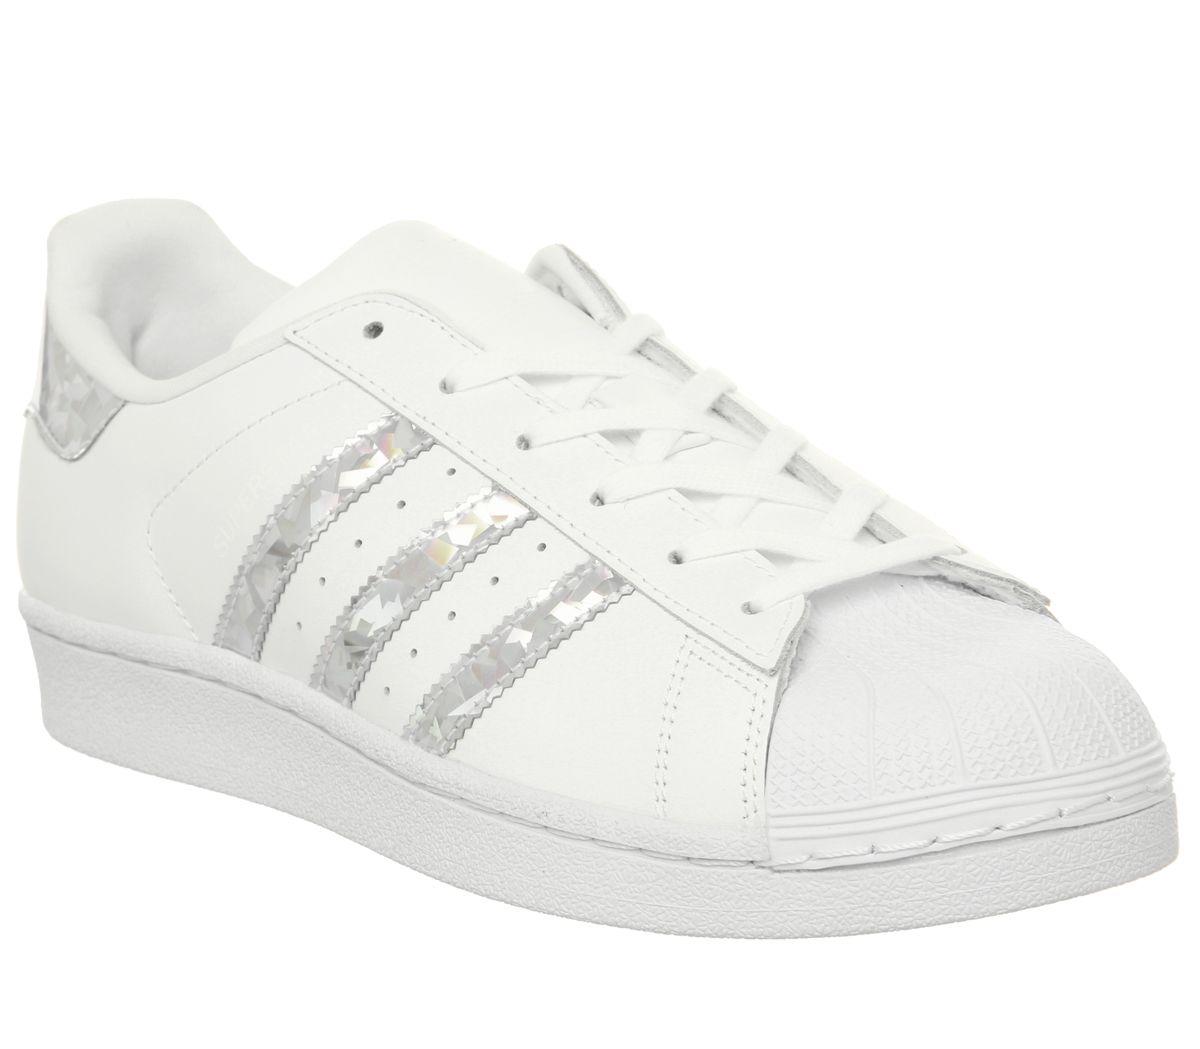 adidas - baskets femme superstar blanc argenté